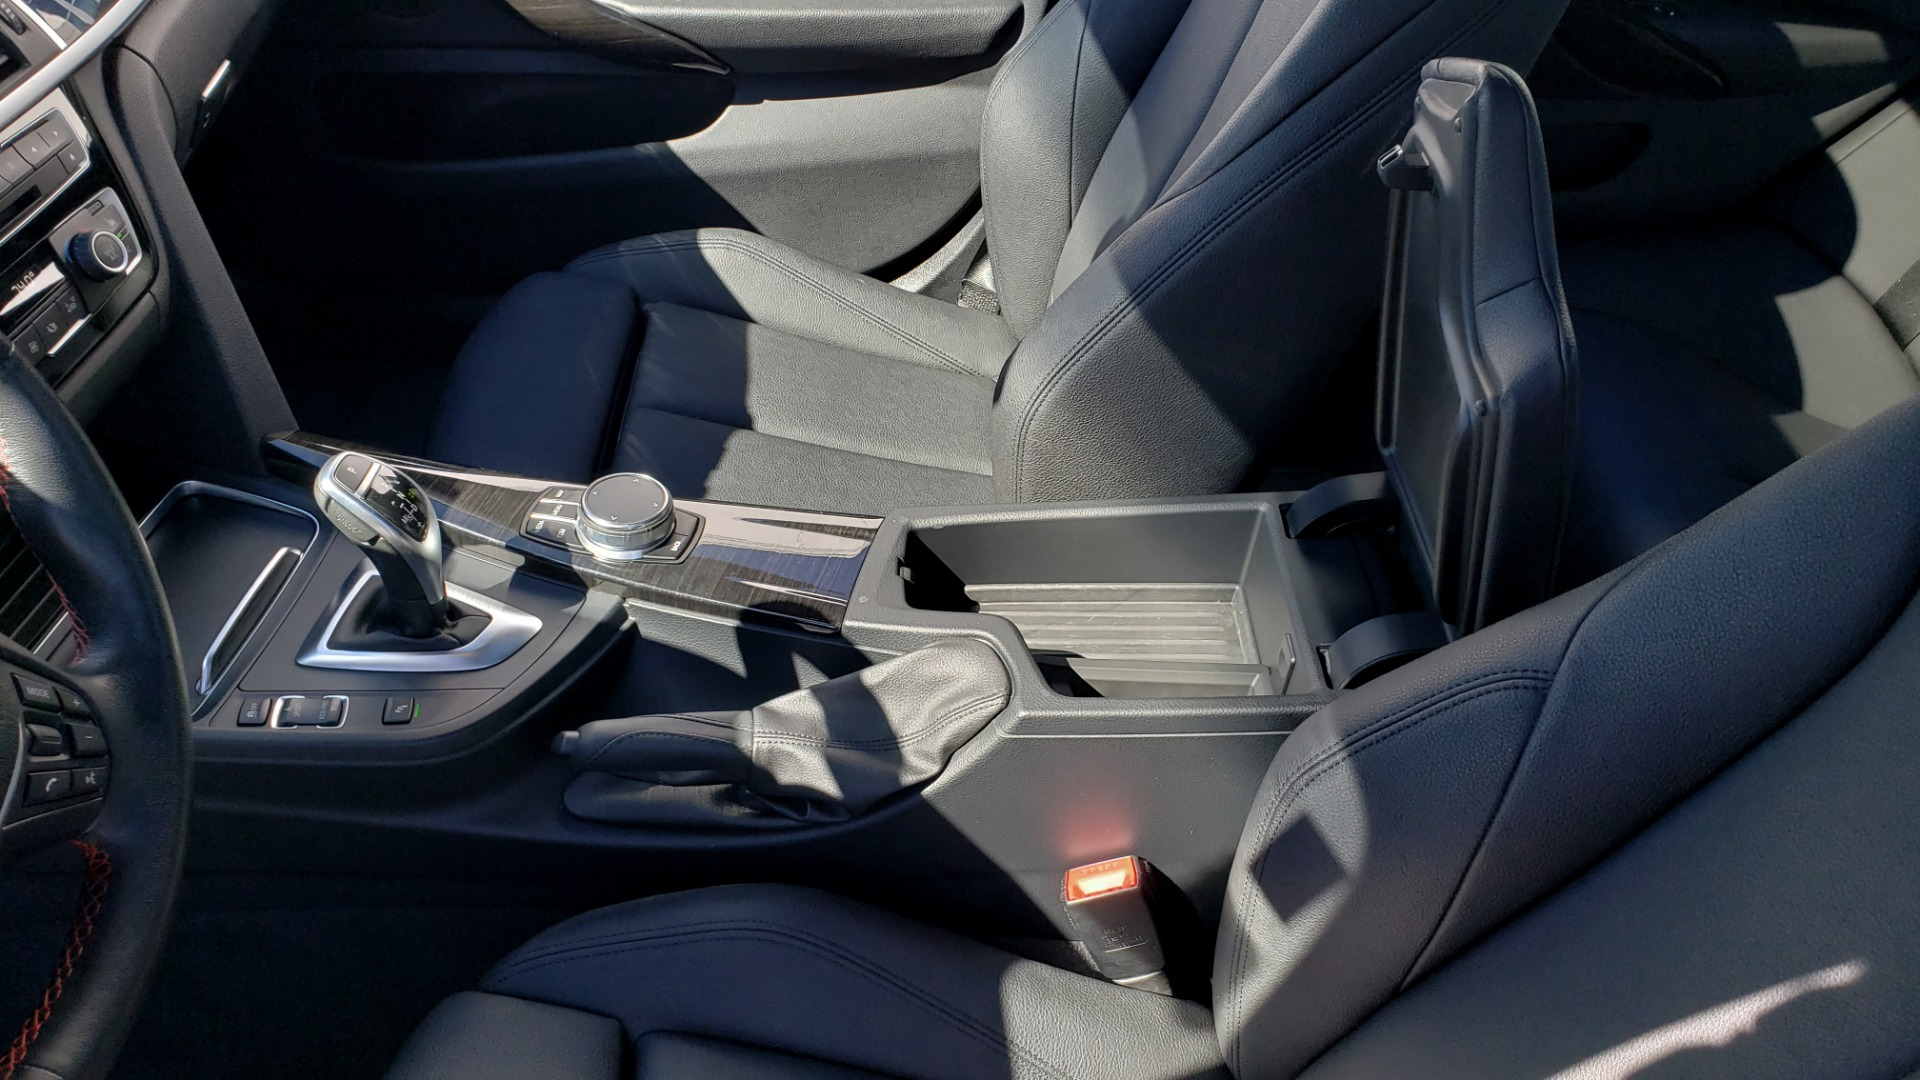 Used 2018 BMW 4 SERIES 430IXDRIVE / PREMIUM / NAV / SUNROOF / ESSENTIALS PKG for sale $29,495 at Formula Imports in Charlotte NC 28227 54